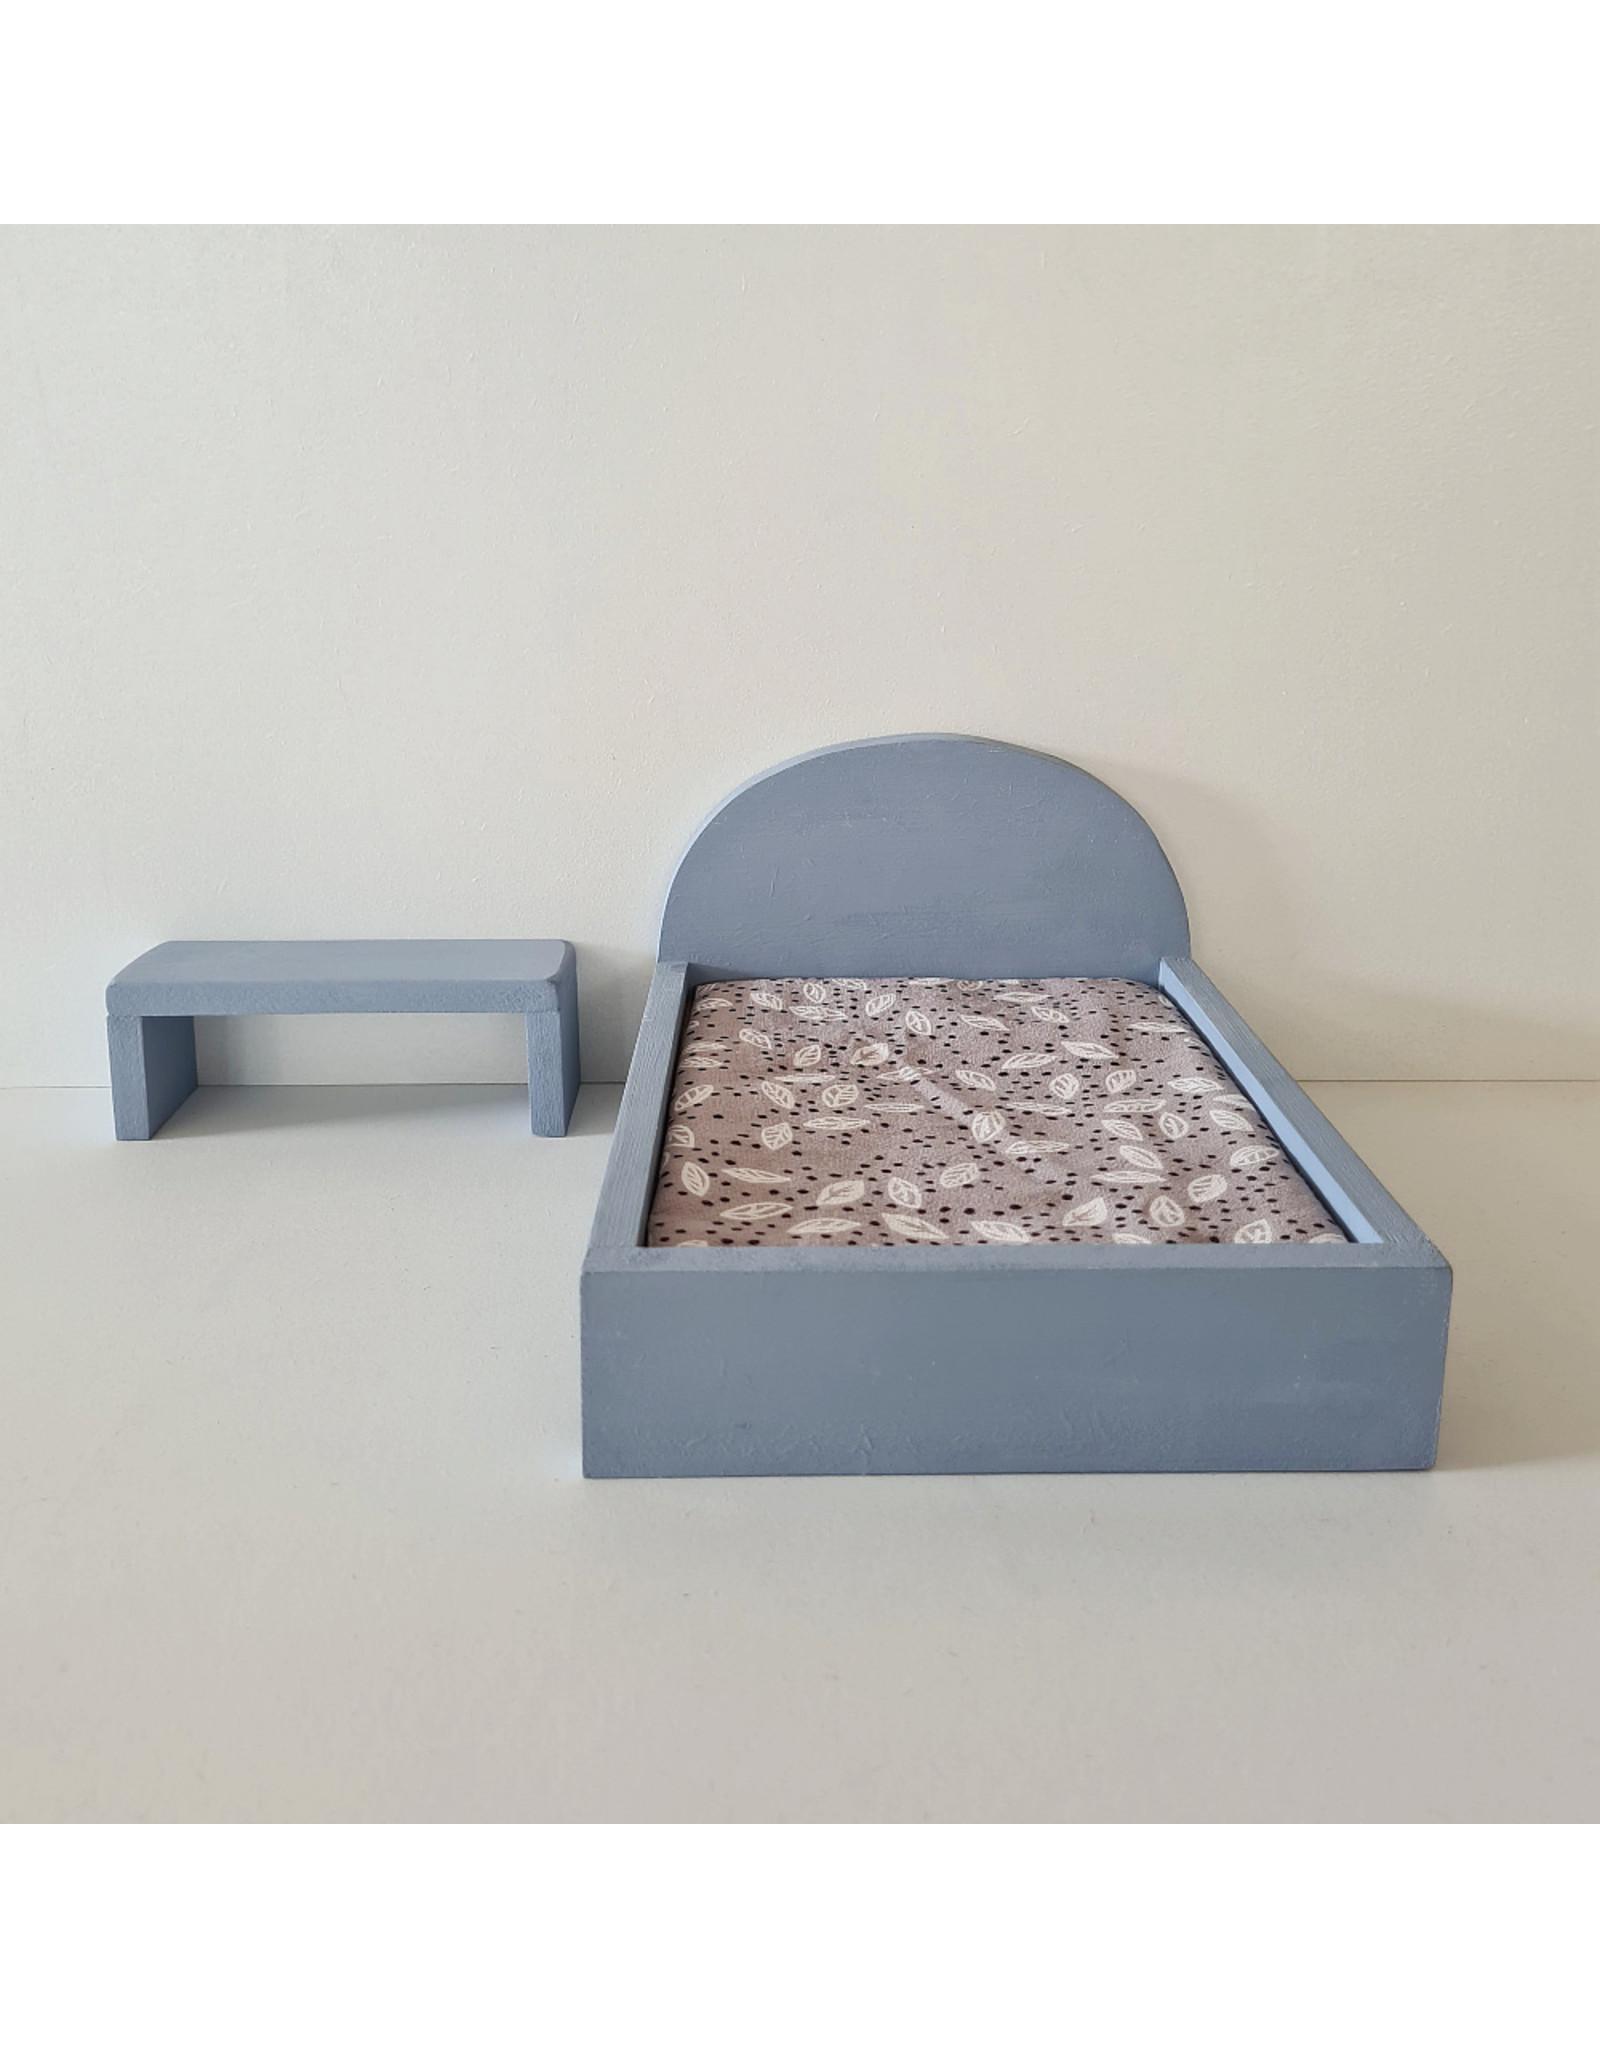 Project Dollhouse Bijzet Tafel voor Maileg Bed - Blurry Blue